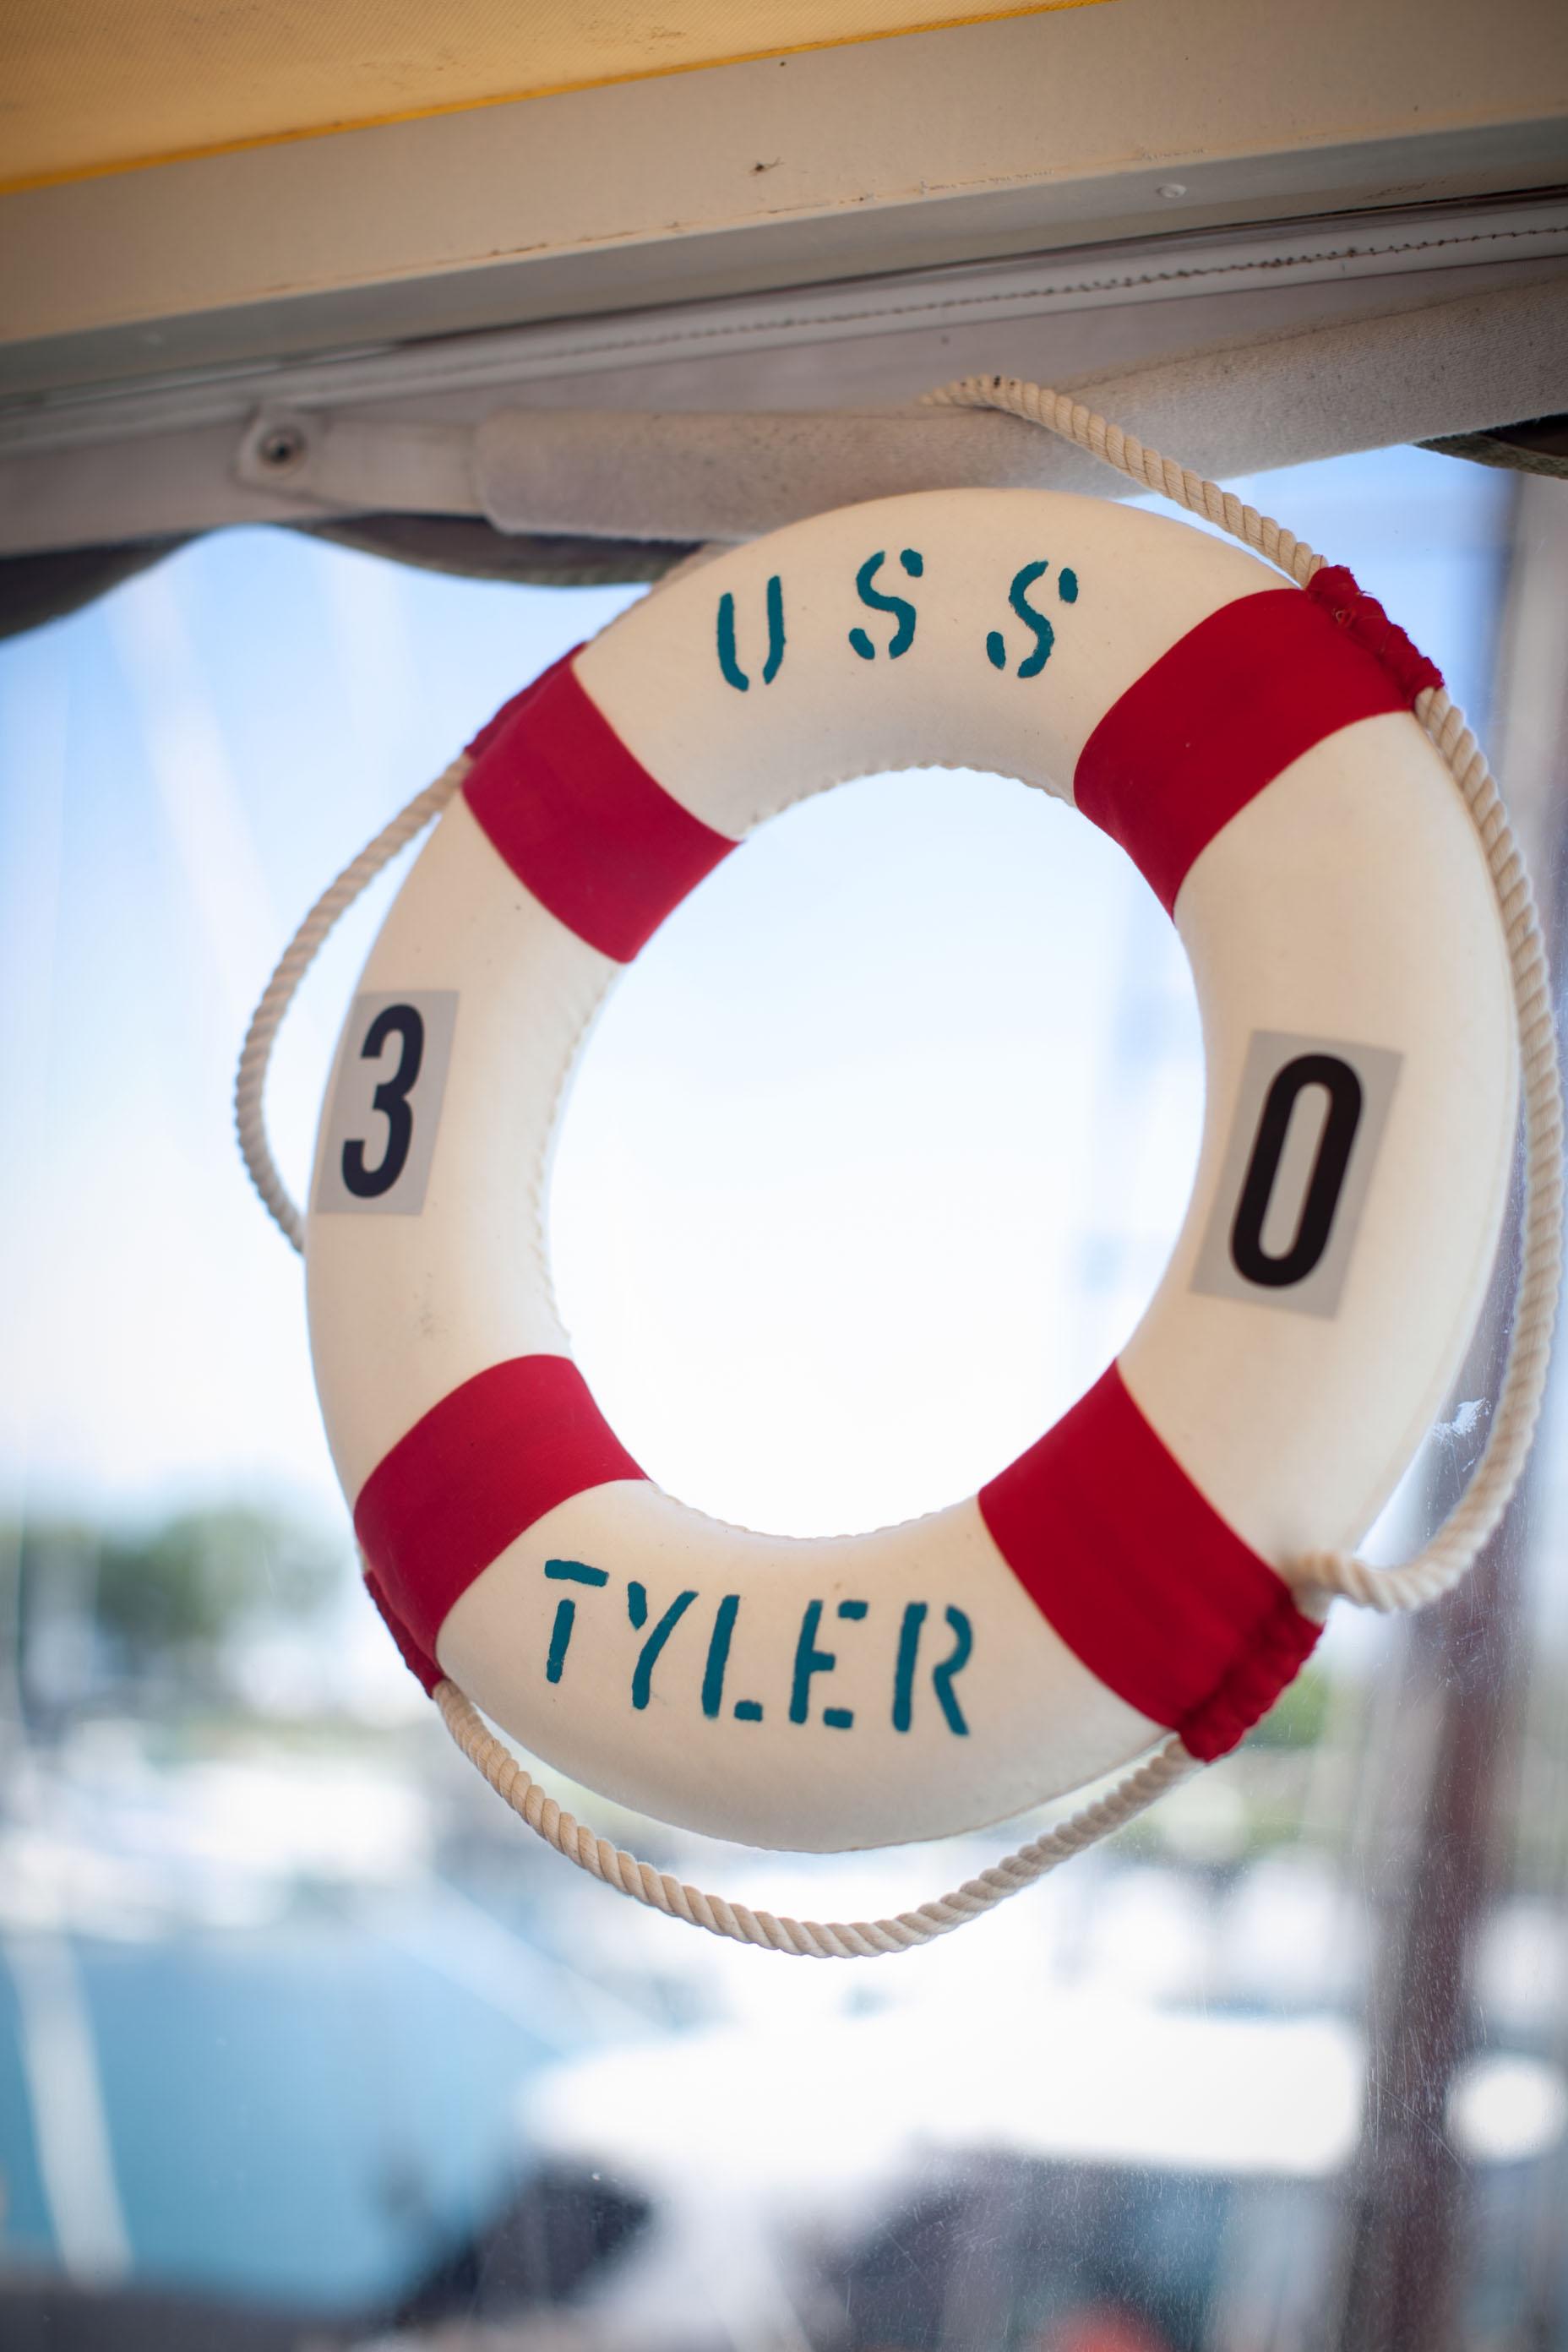 tyler's 30th chinanigans birthday celebration trolley tour of the loop burnham harbor yacht tour-19.jpg